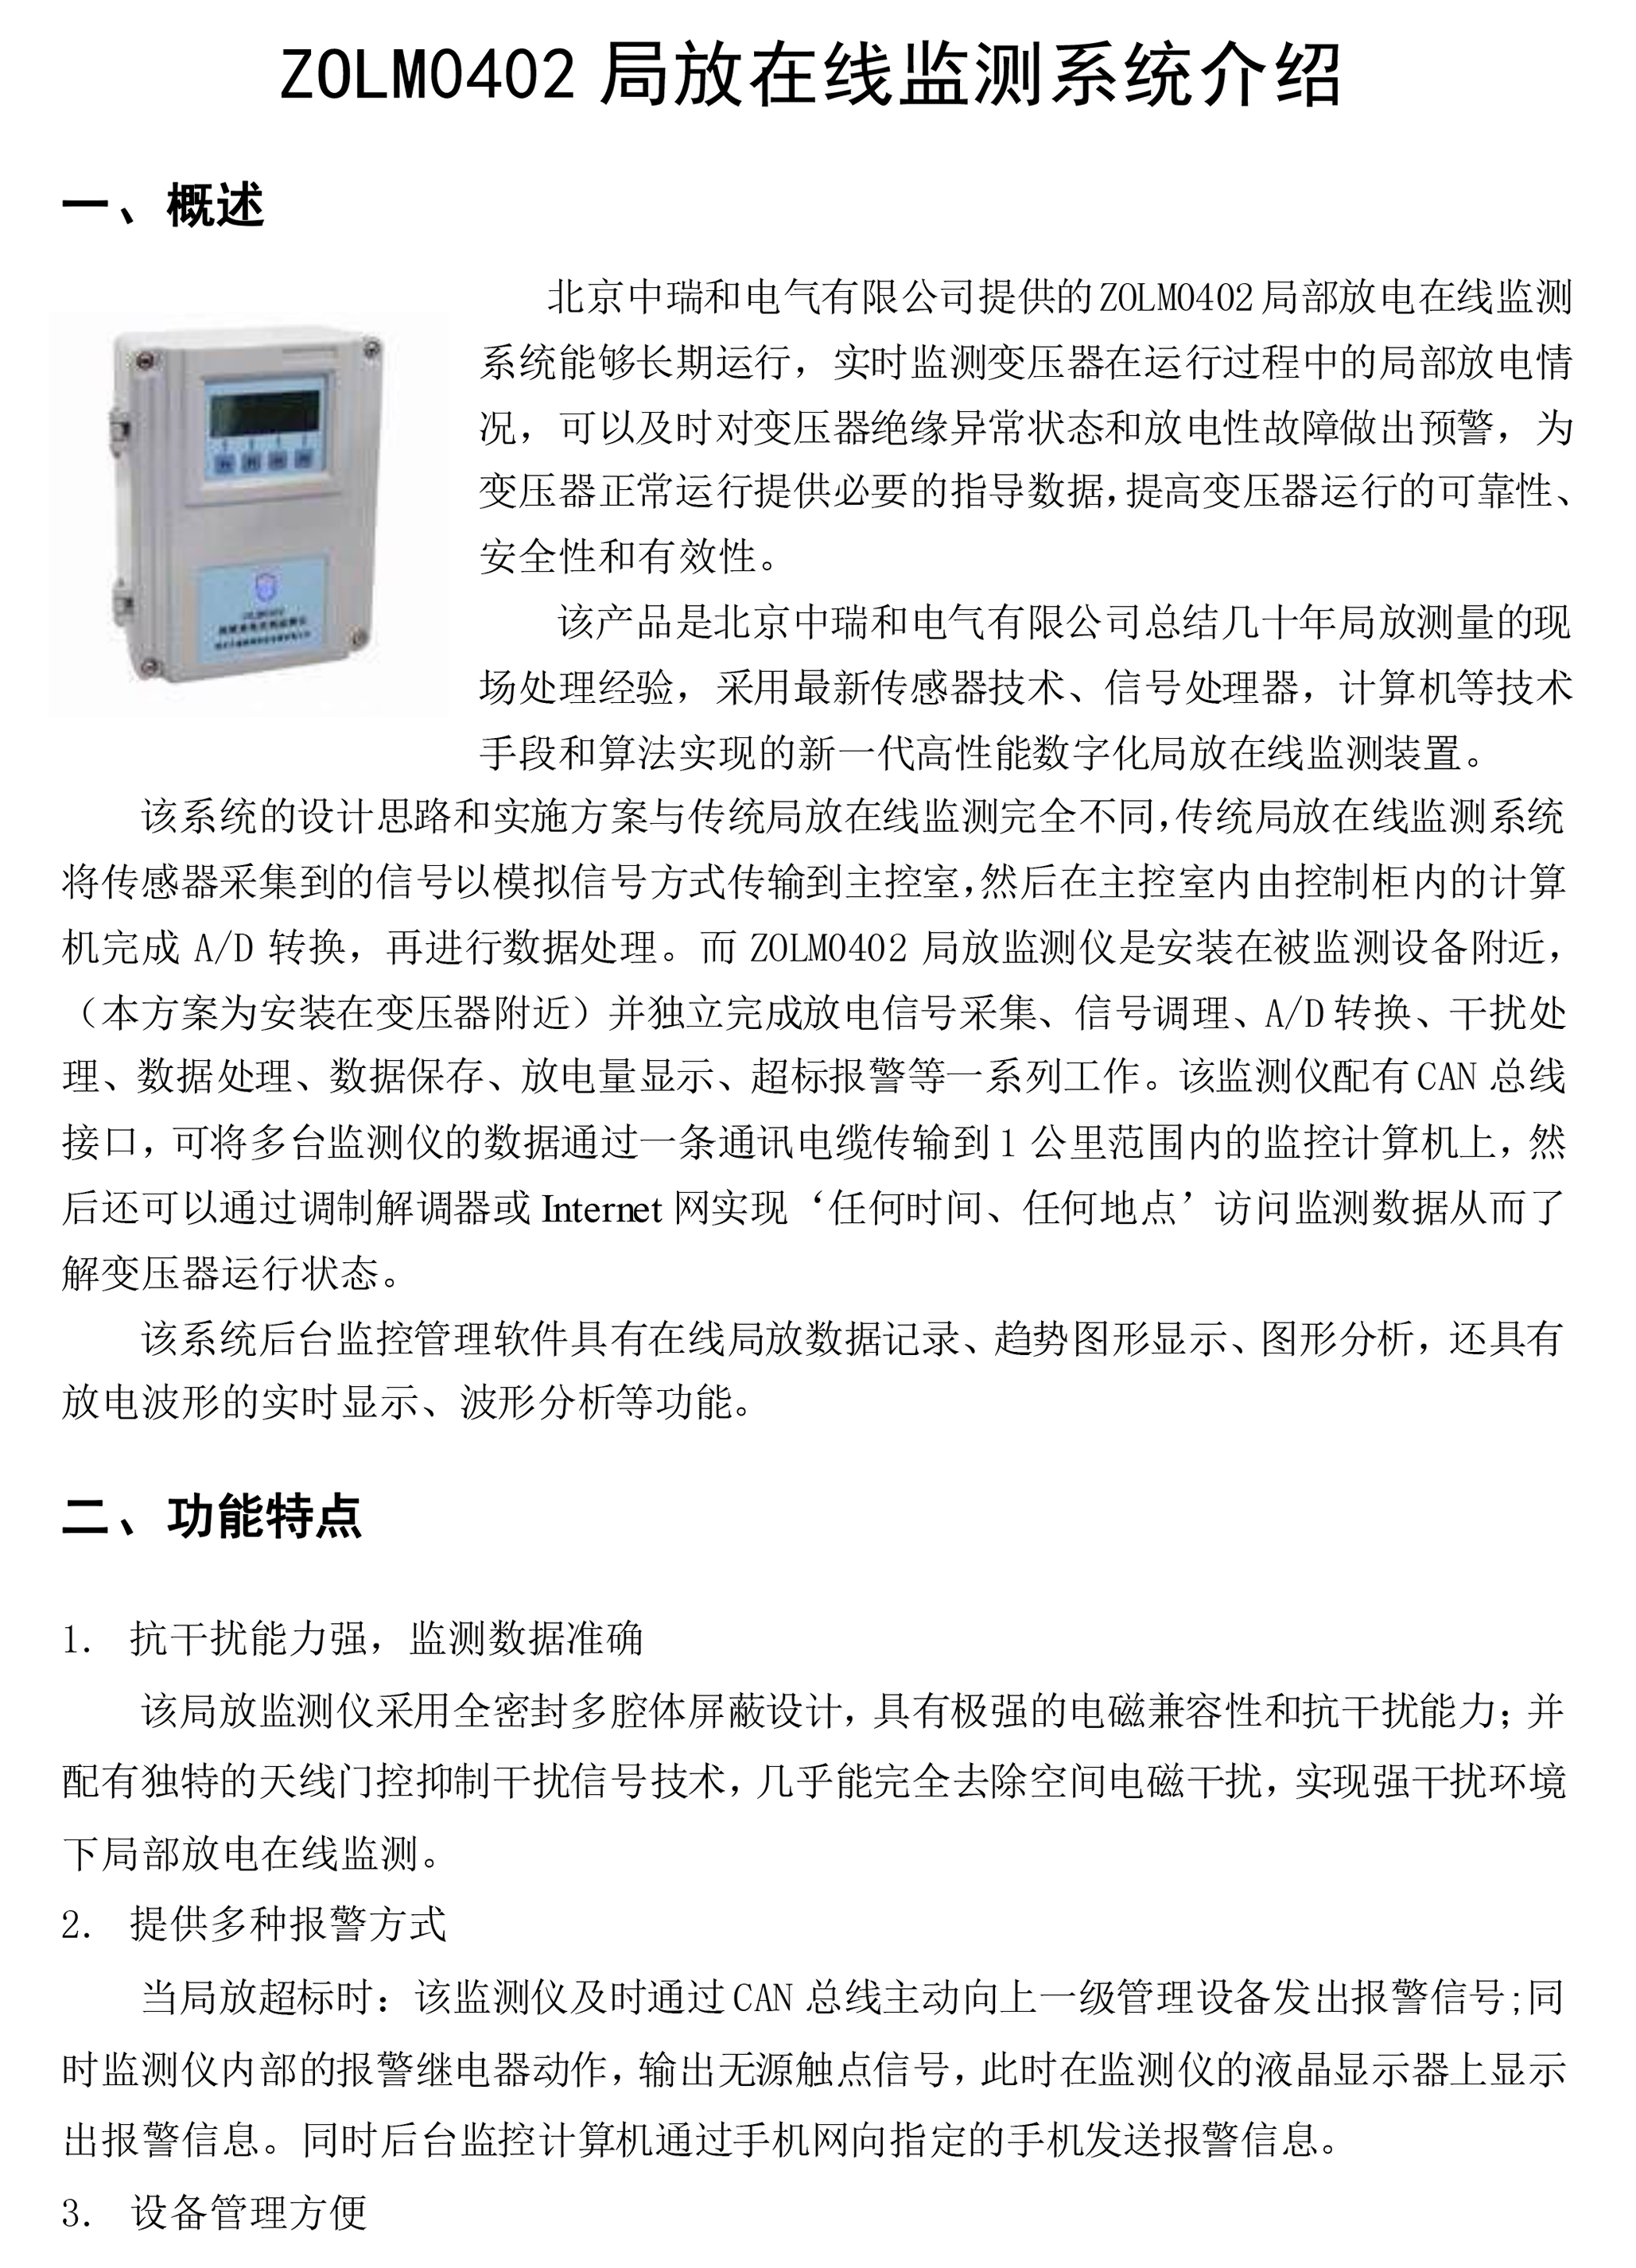 ZOLM0402 局部放电在线监测系统介绍